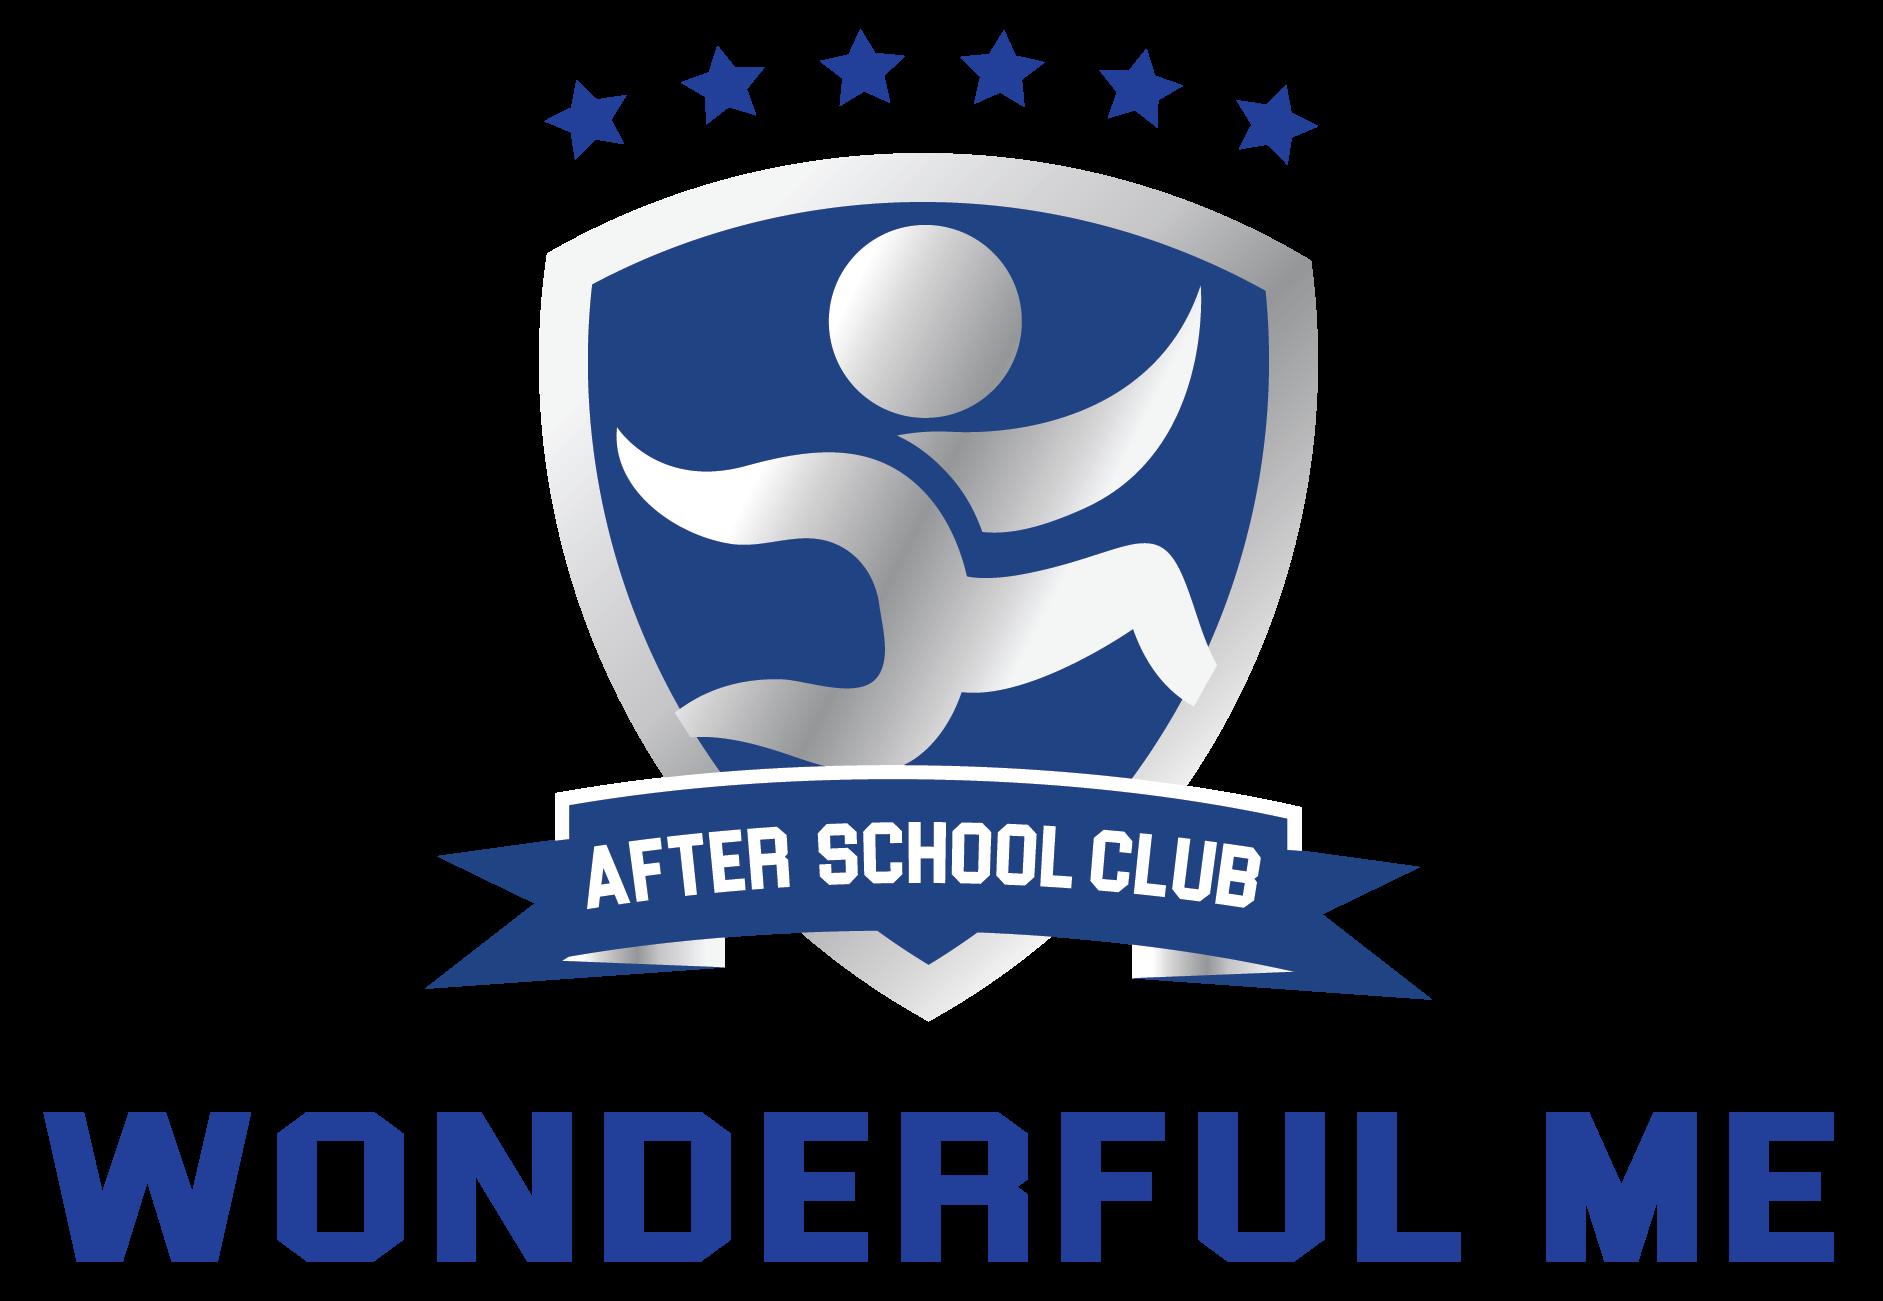 https://www.mncjobsgulf.com/company/wonderful-me-after-school-club